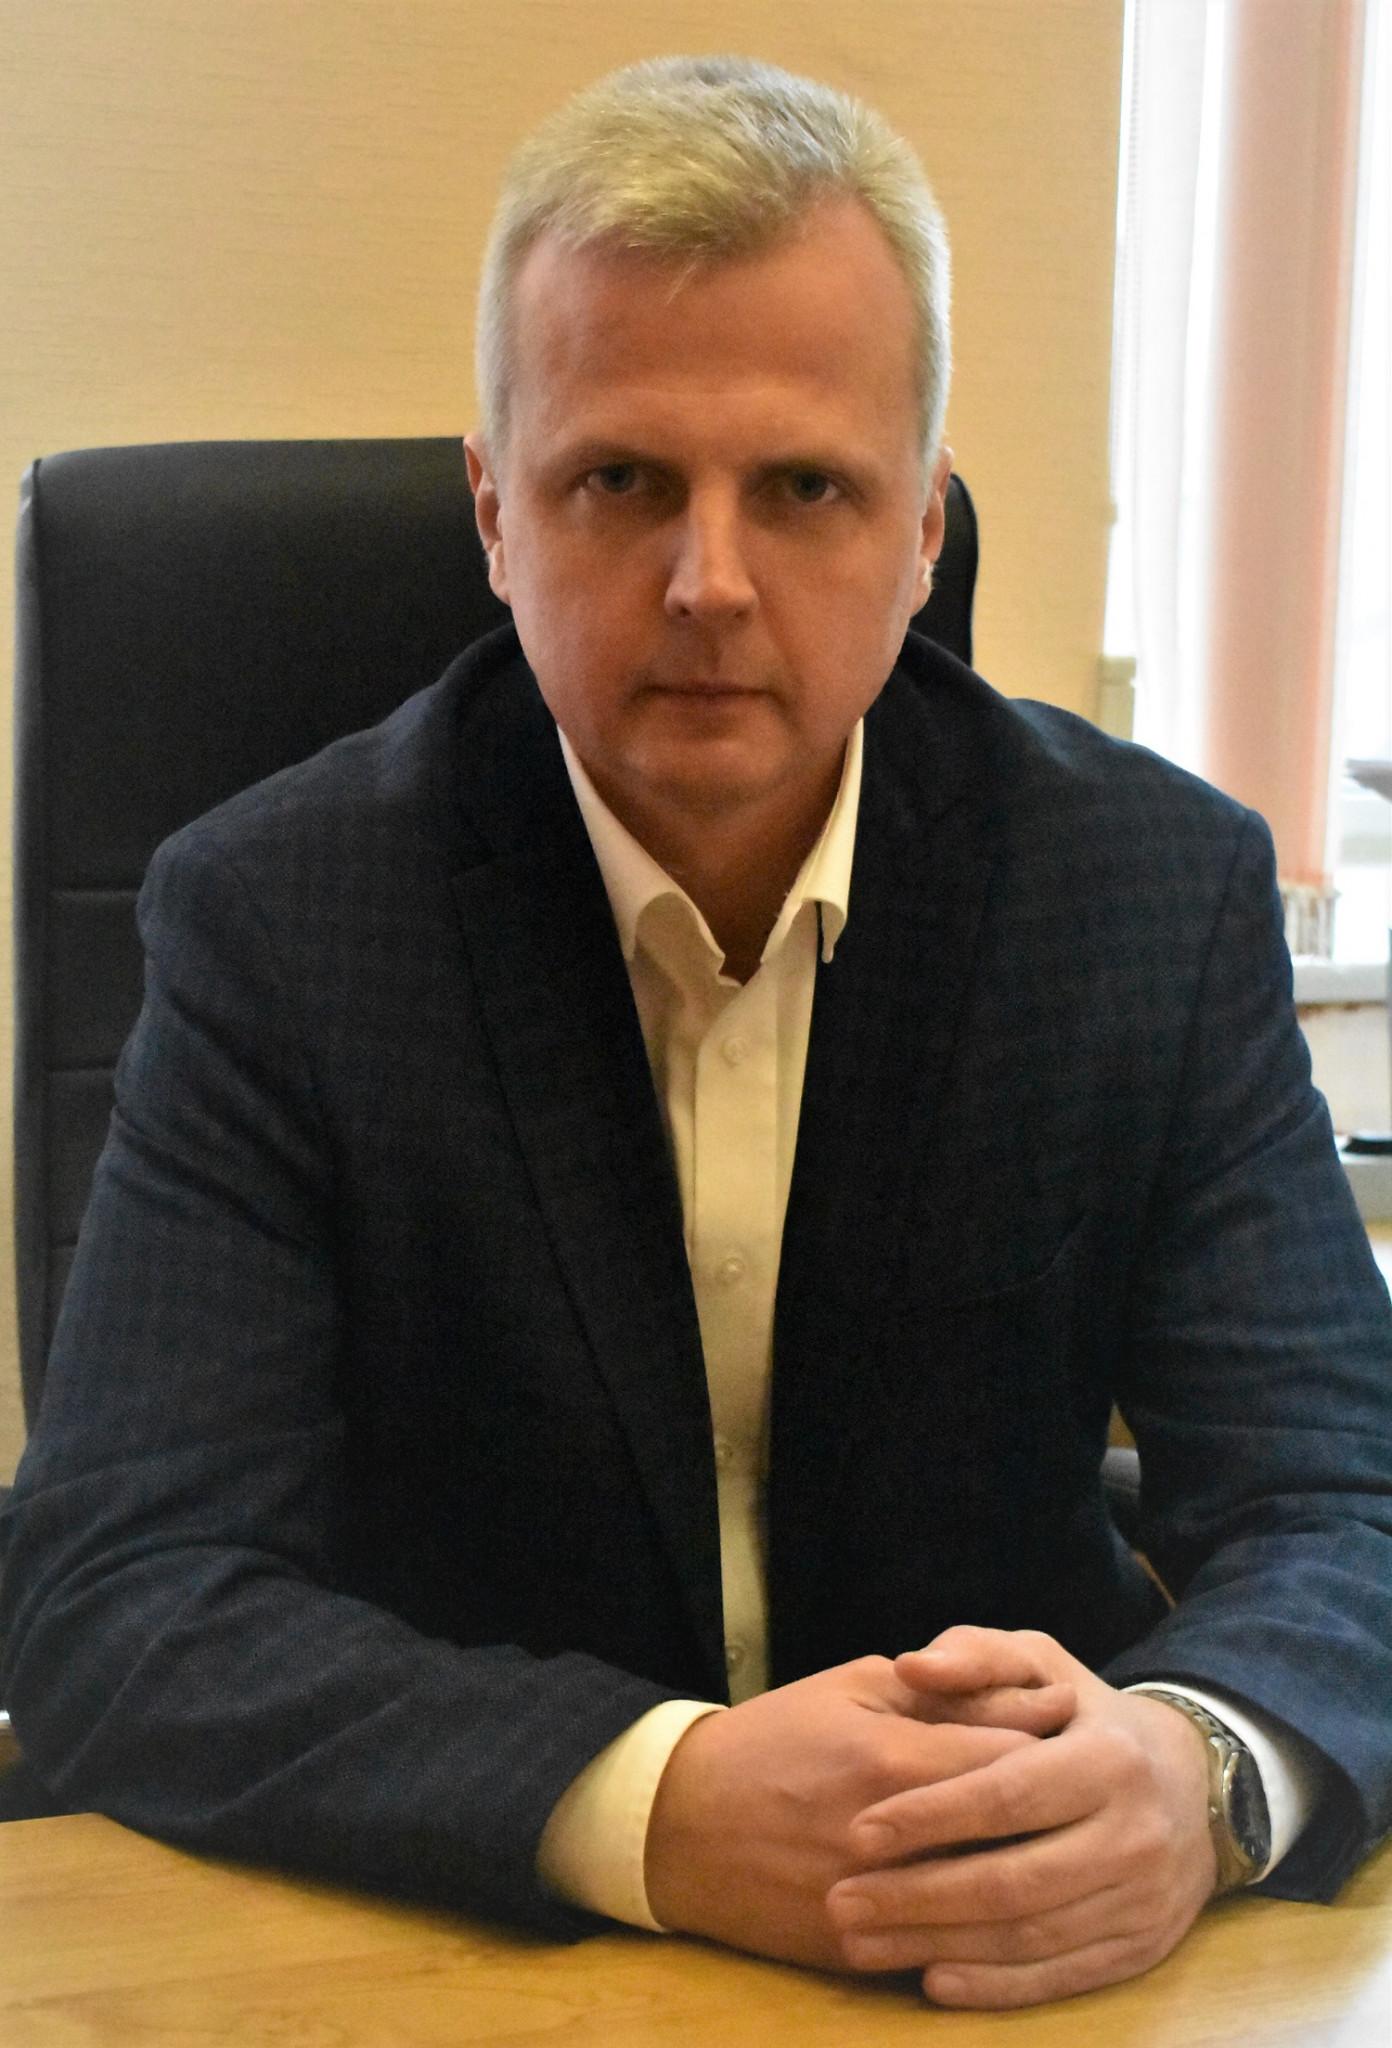 Oleksiy Krasnorutskyy